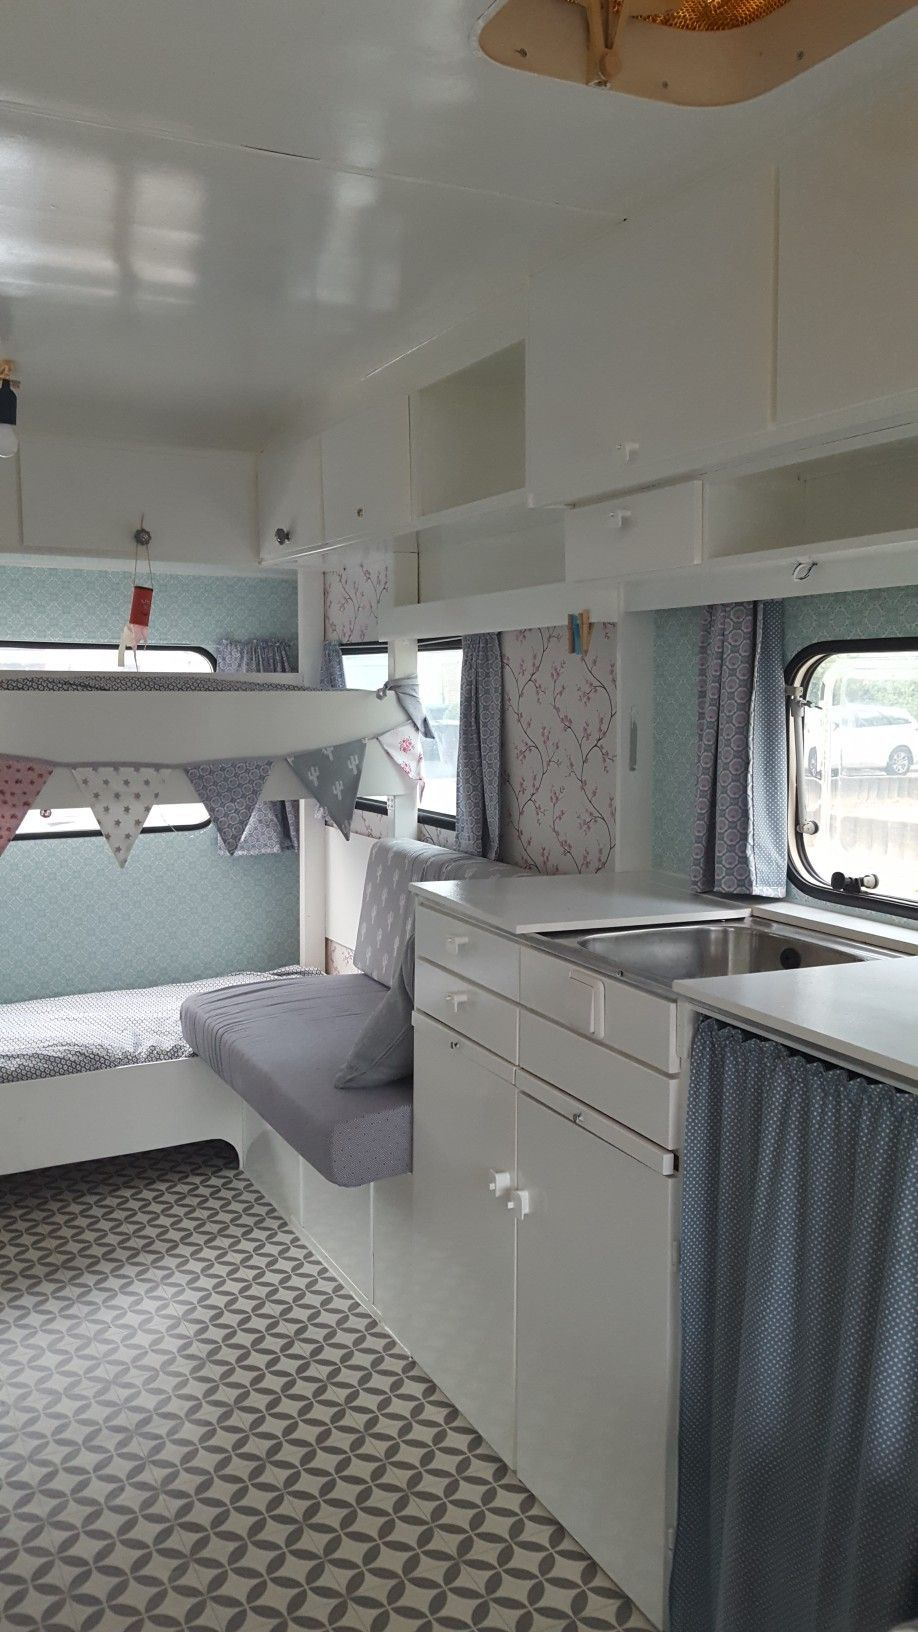 pingl par boisseau sur caravane relooking pinterest caravane relooking caravane et roulotte. Black Bedroom Furniture Sets. Home Design Ideas